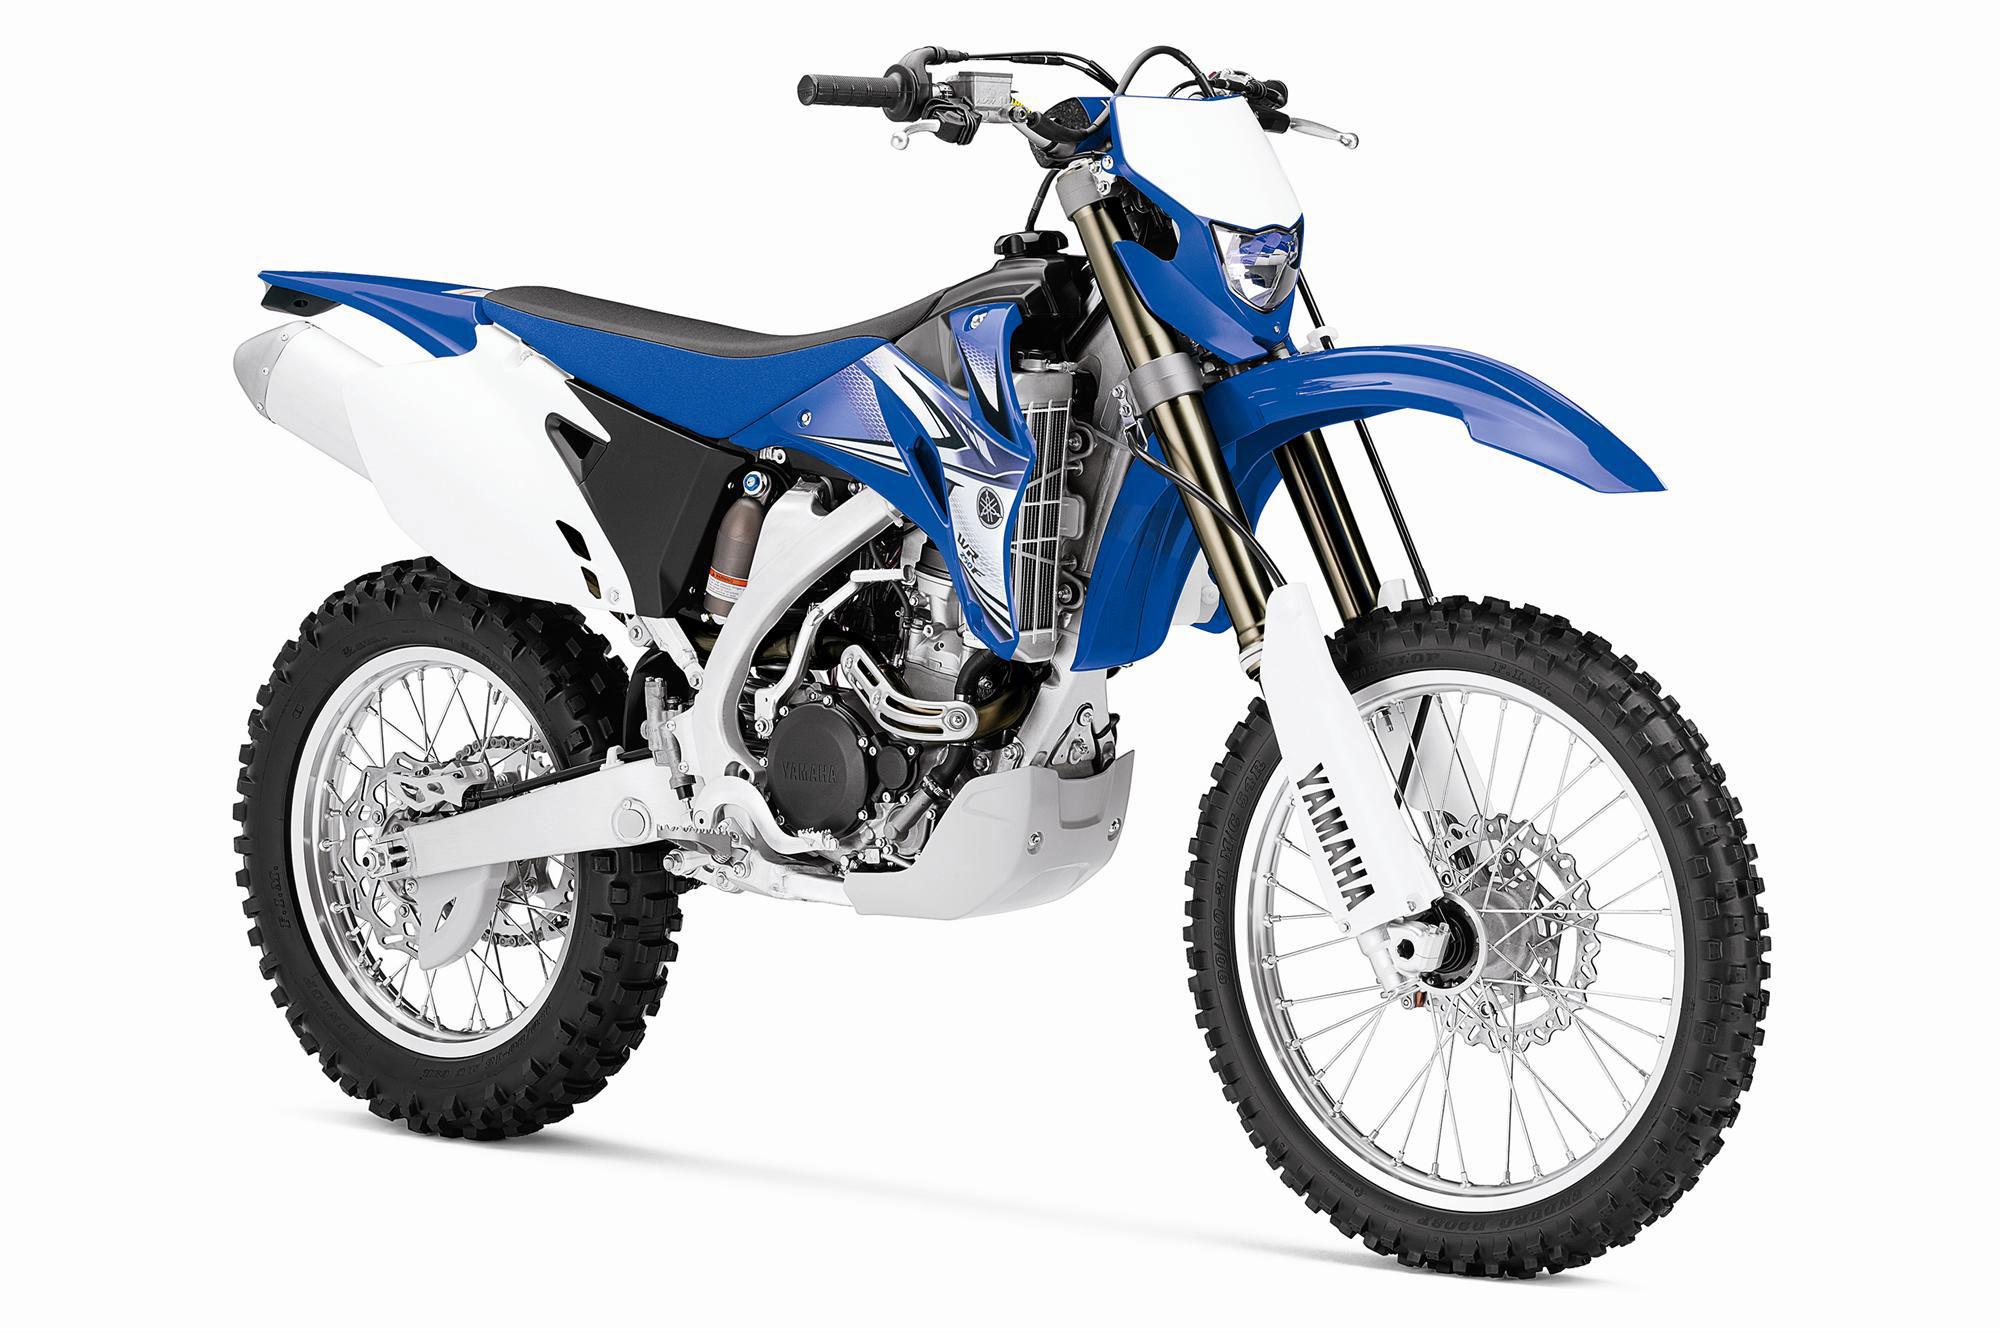 2017 Yamaha Wr250 Manual